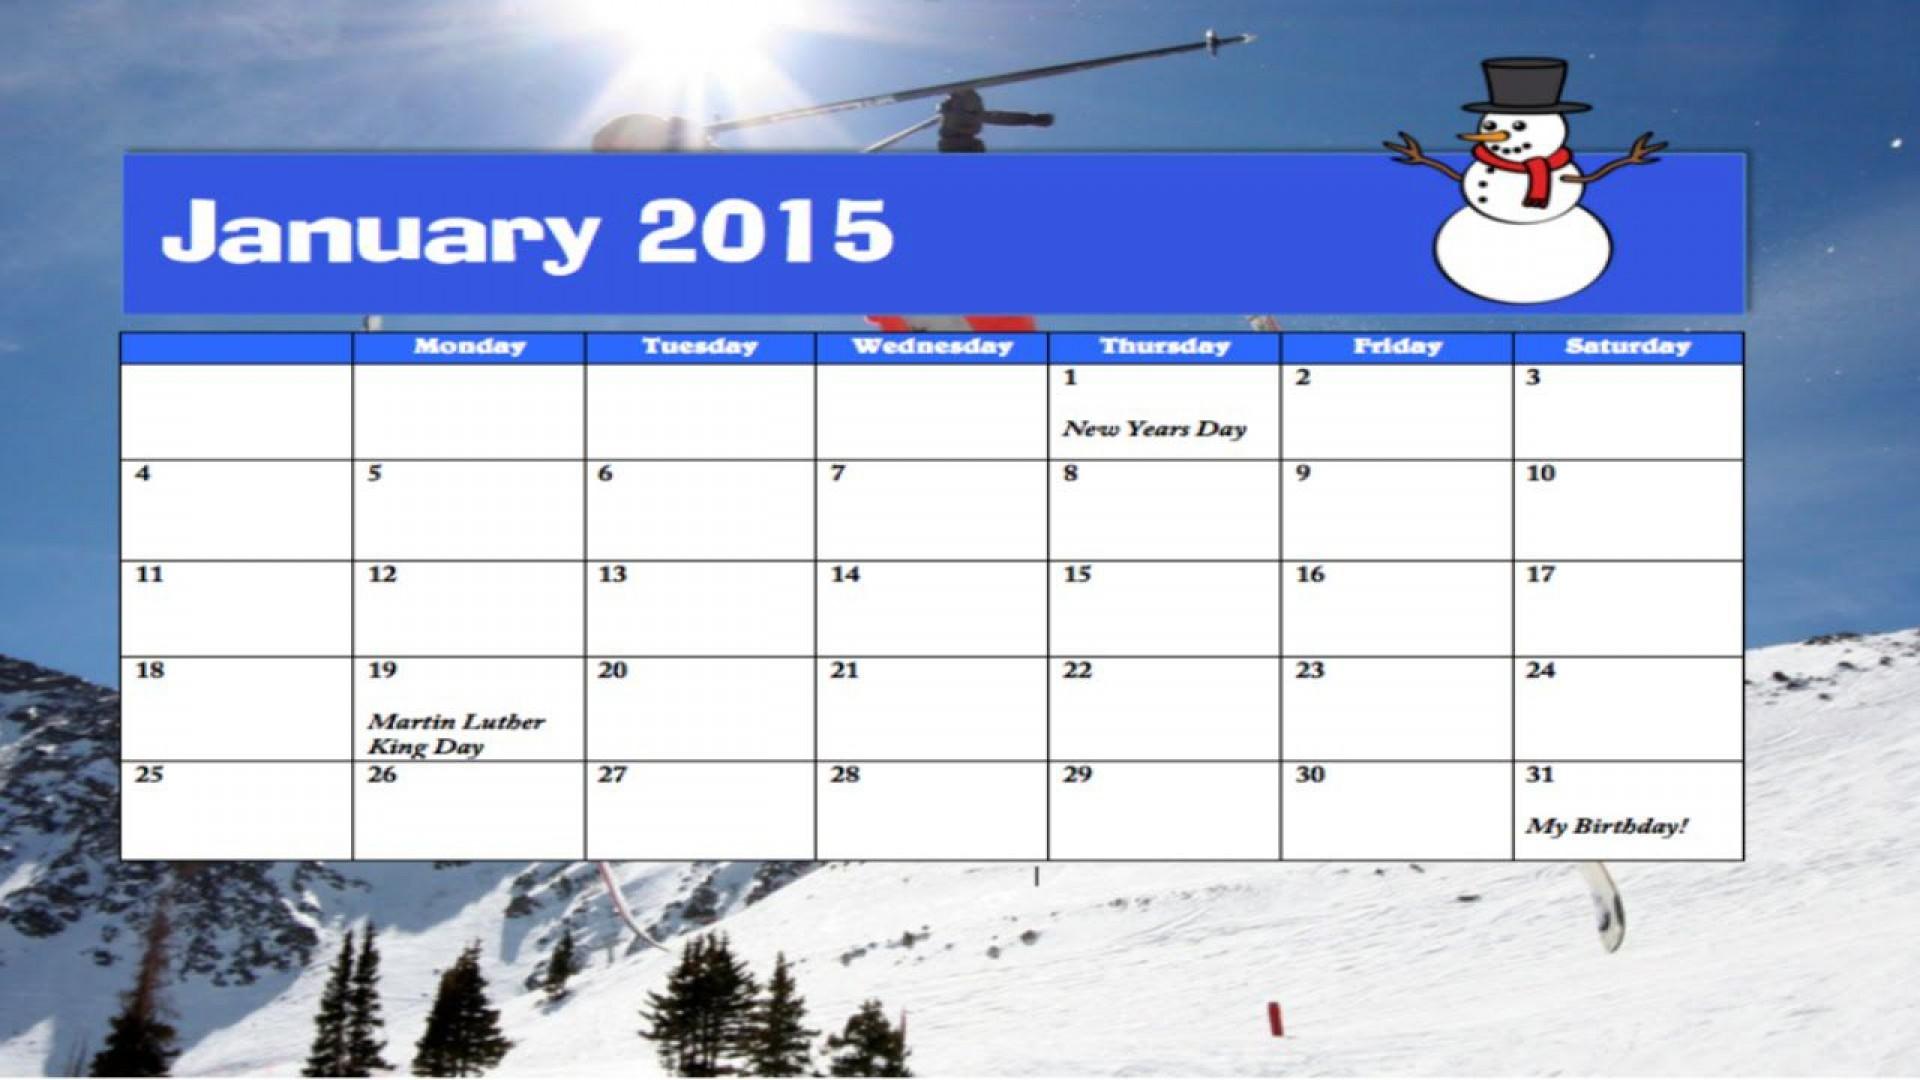 003 Breathtaking Calendar Template For Word 2007 Idea 1920